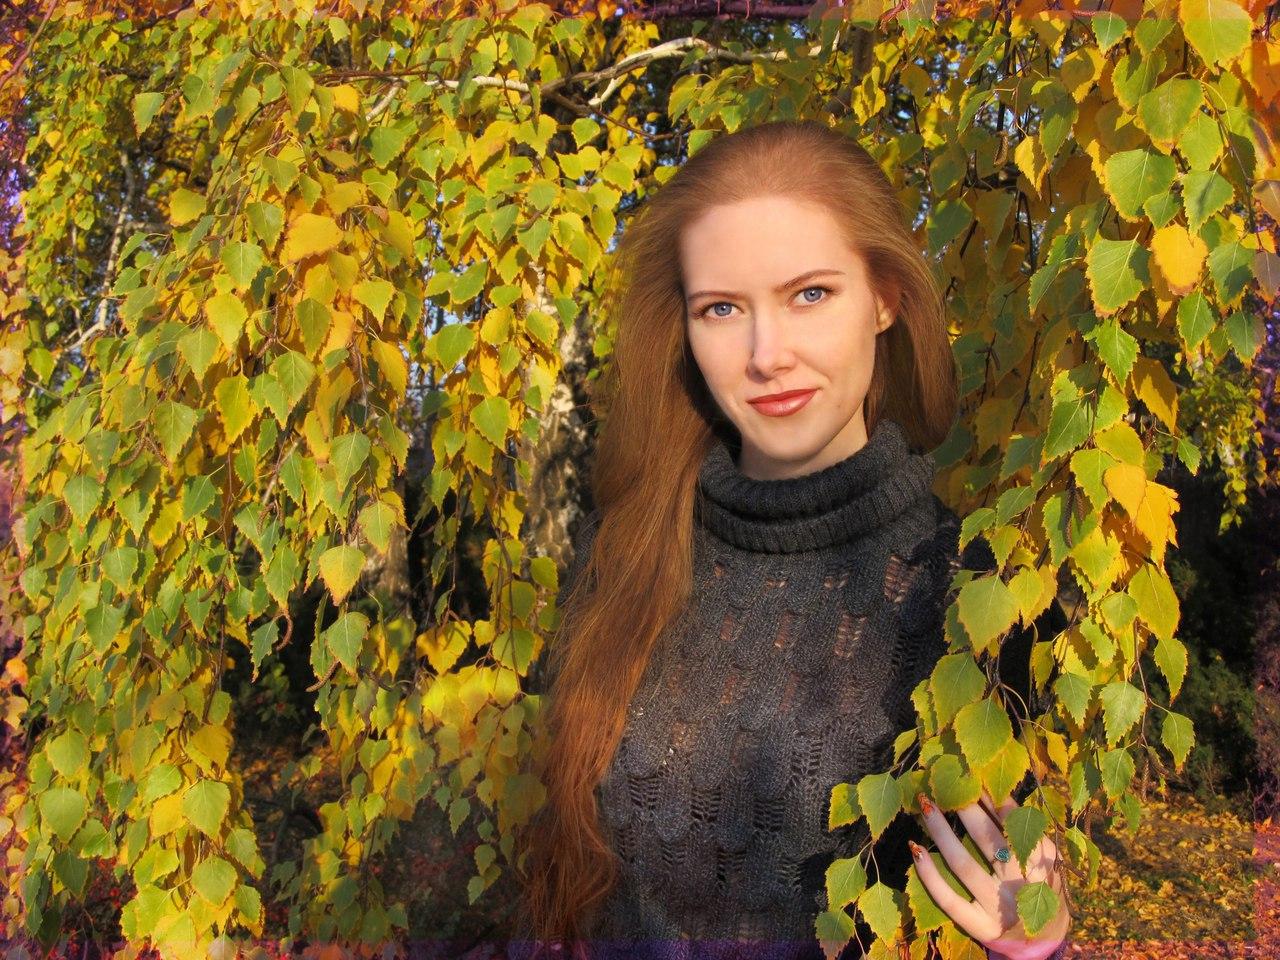 Рыжие девушки (23 фото) - Valery, 31 год, Николаев